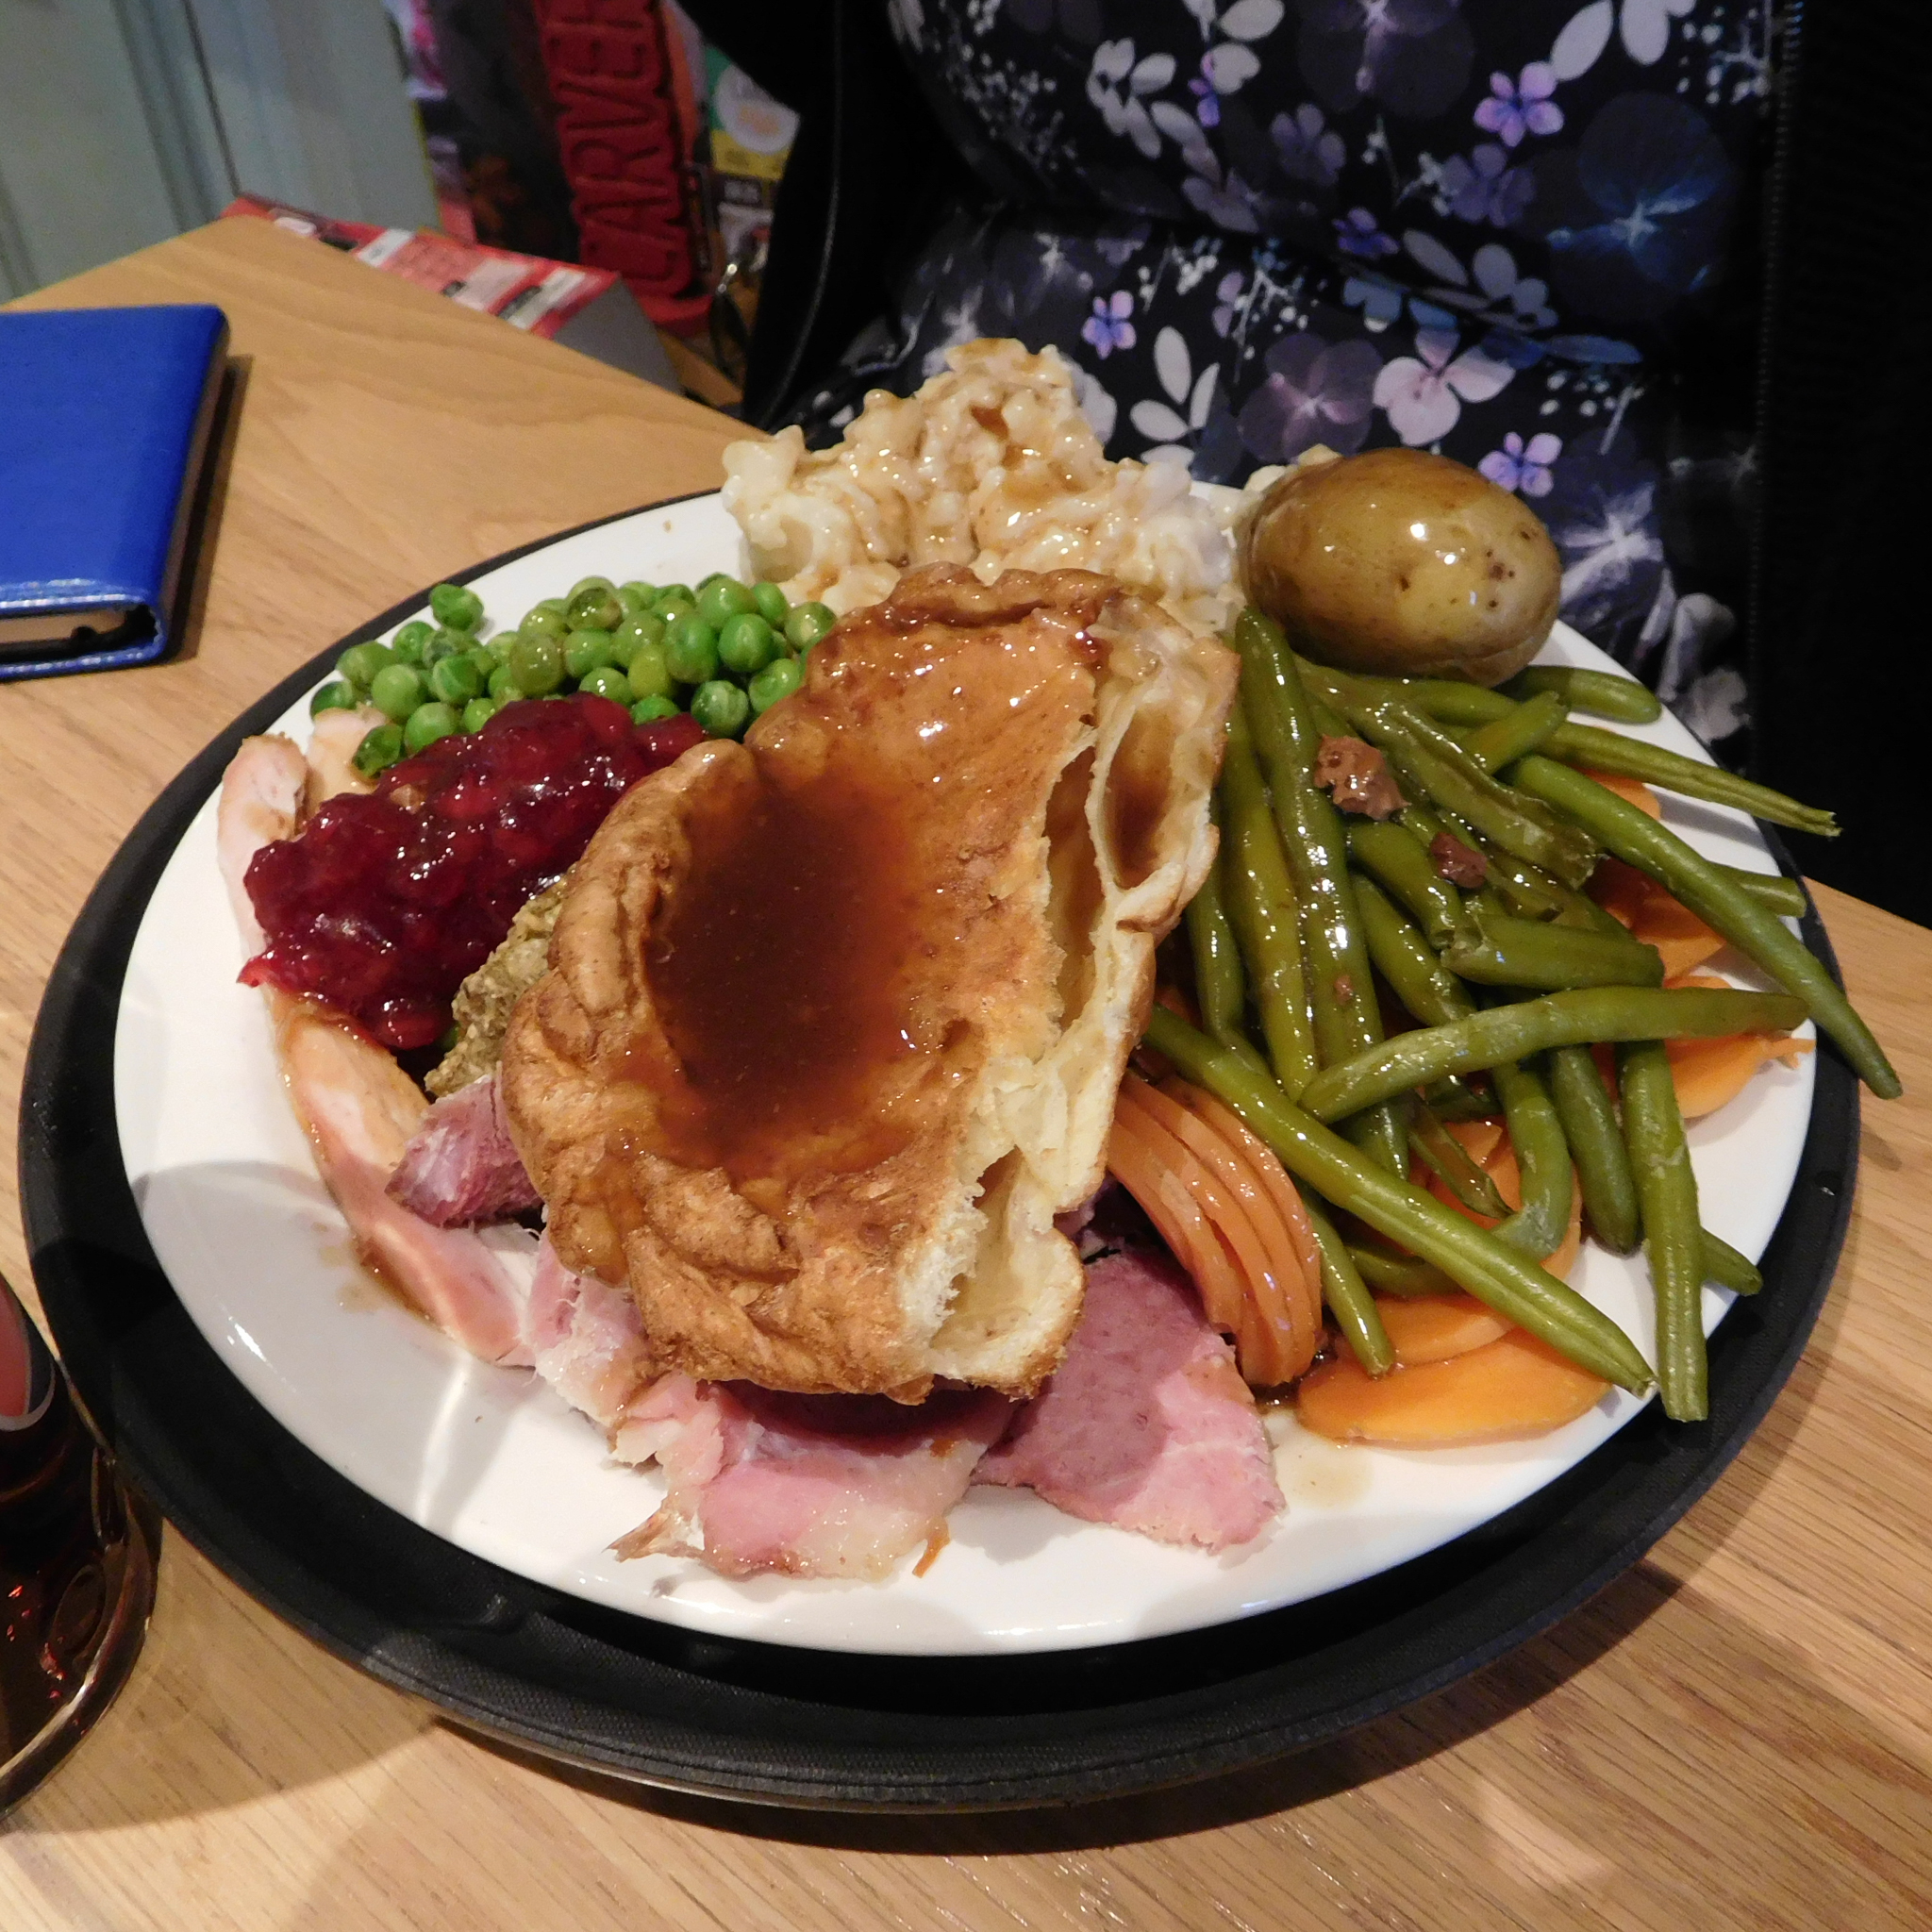 Christine's Carvery Gammon and Turkey